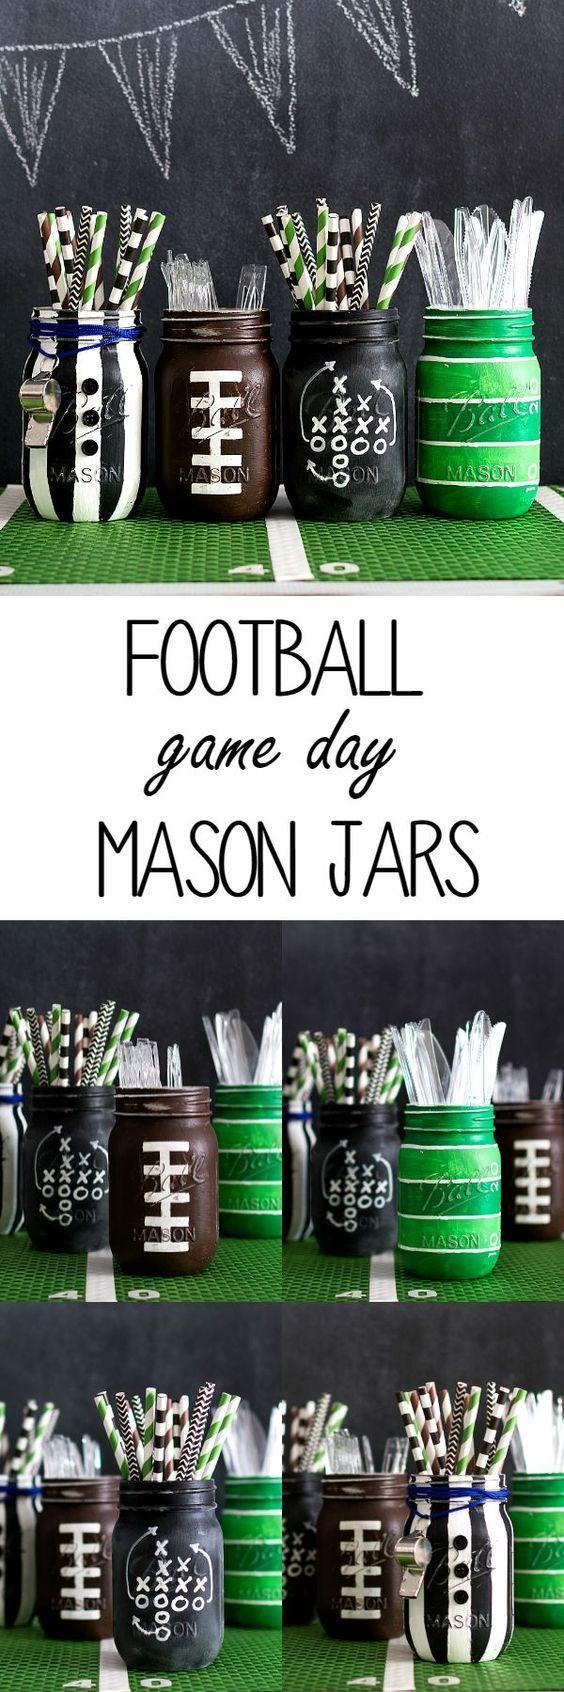 25+ best ideas about Football Field on Pinterest ...